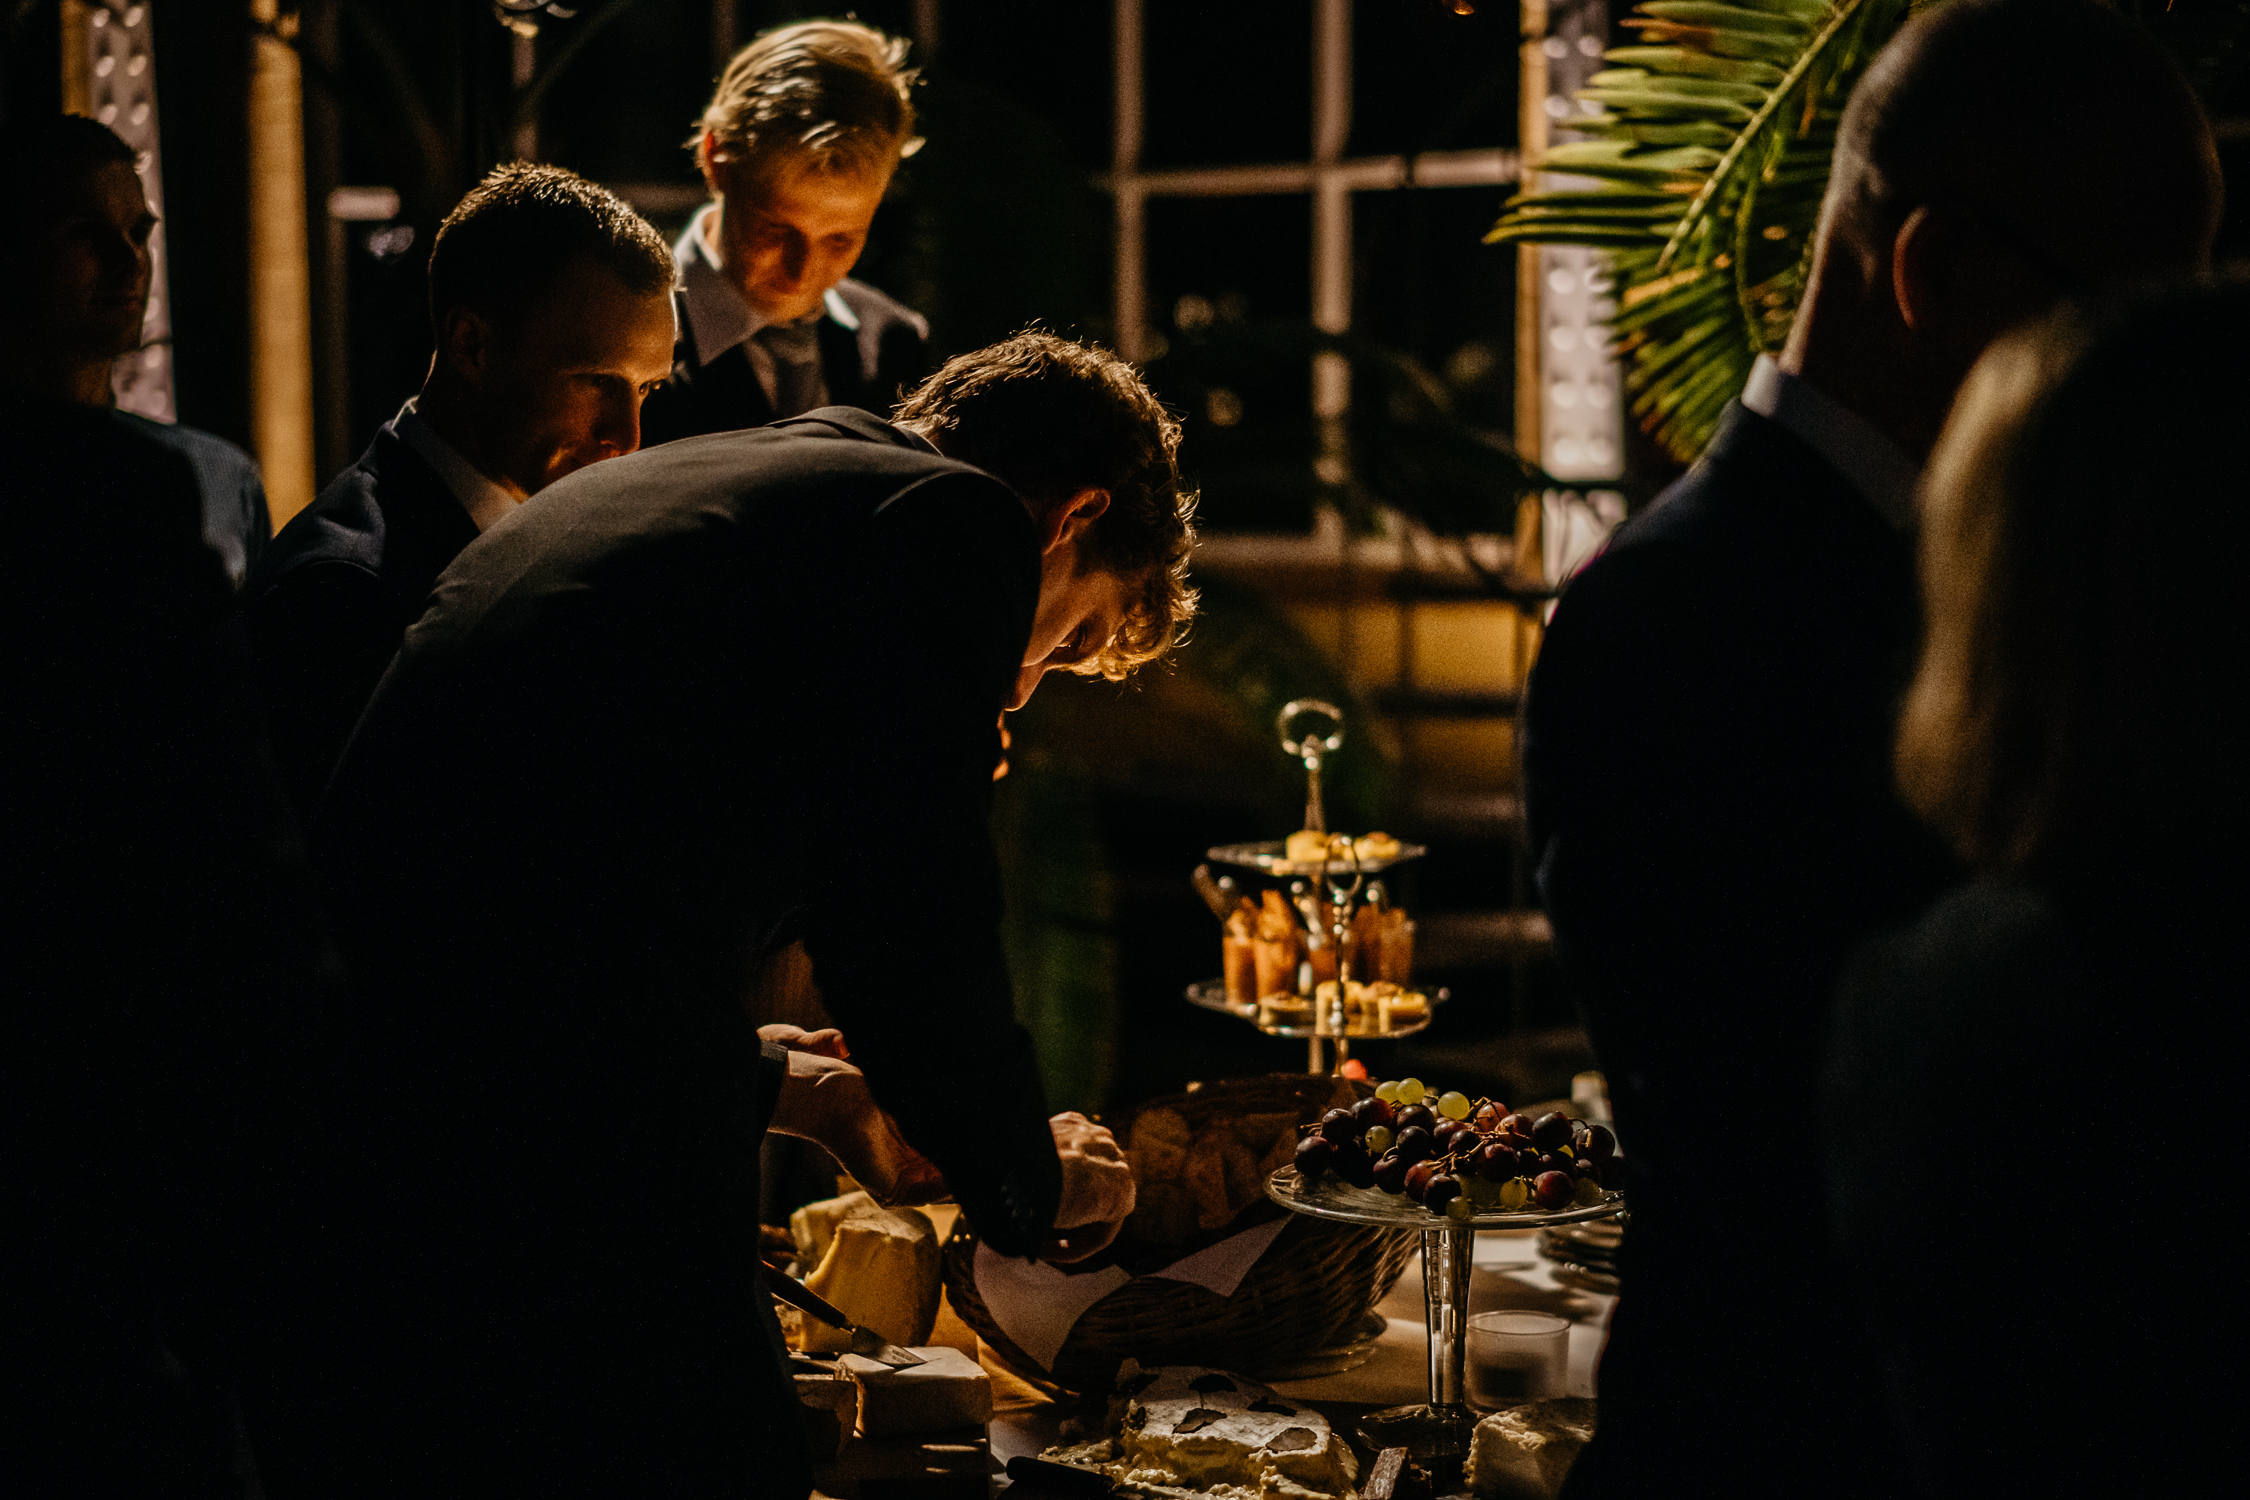 bruiloft feest botaniche tuin in amsterdam mark hadden fotografie